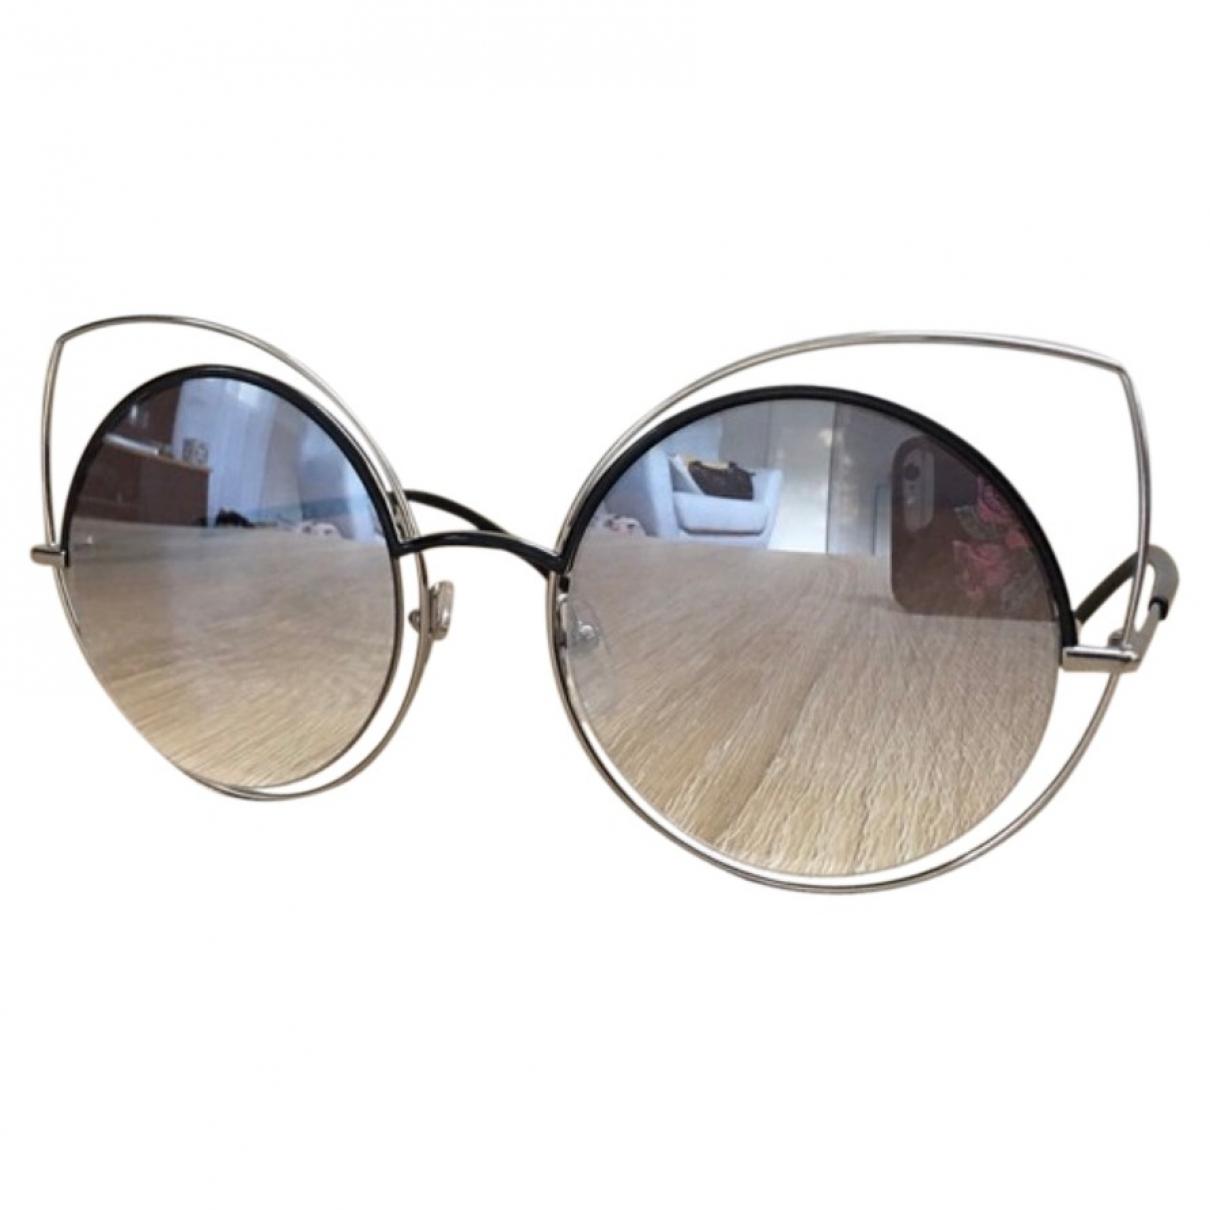 Marc Jacobs \N Silver Metal Sunglasses for Women \N